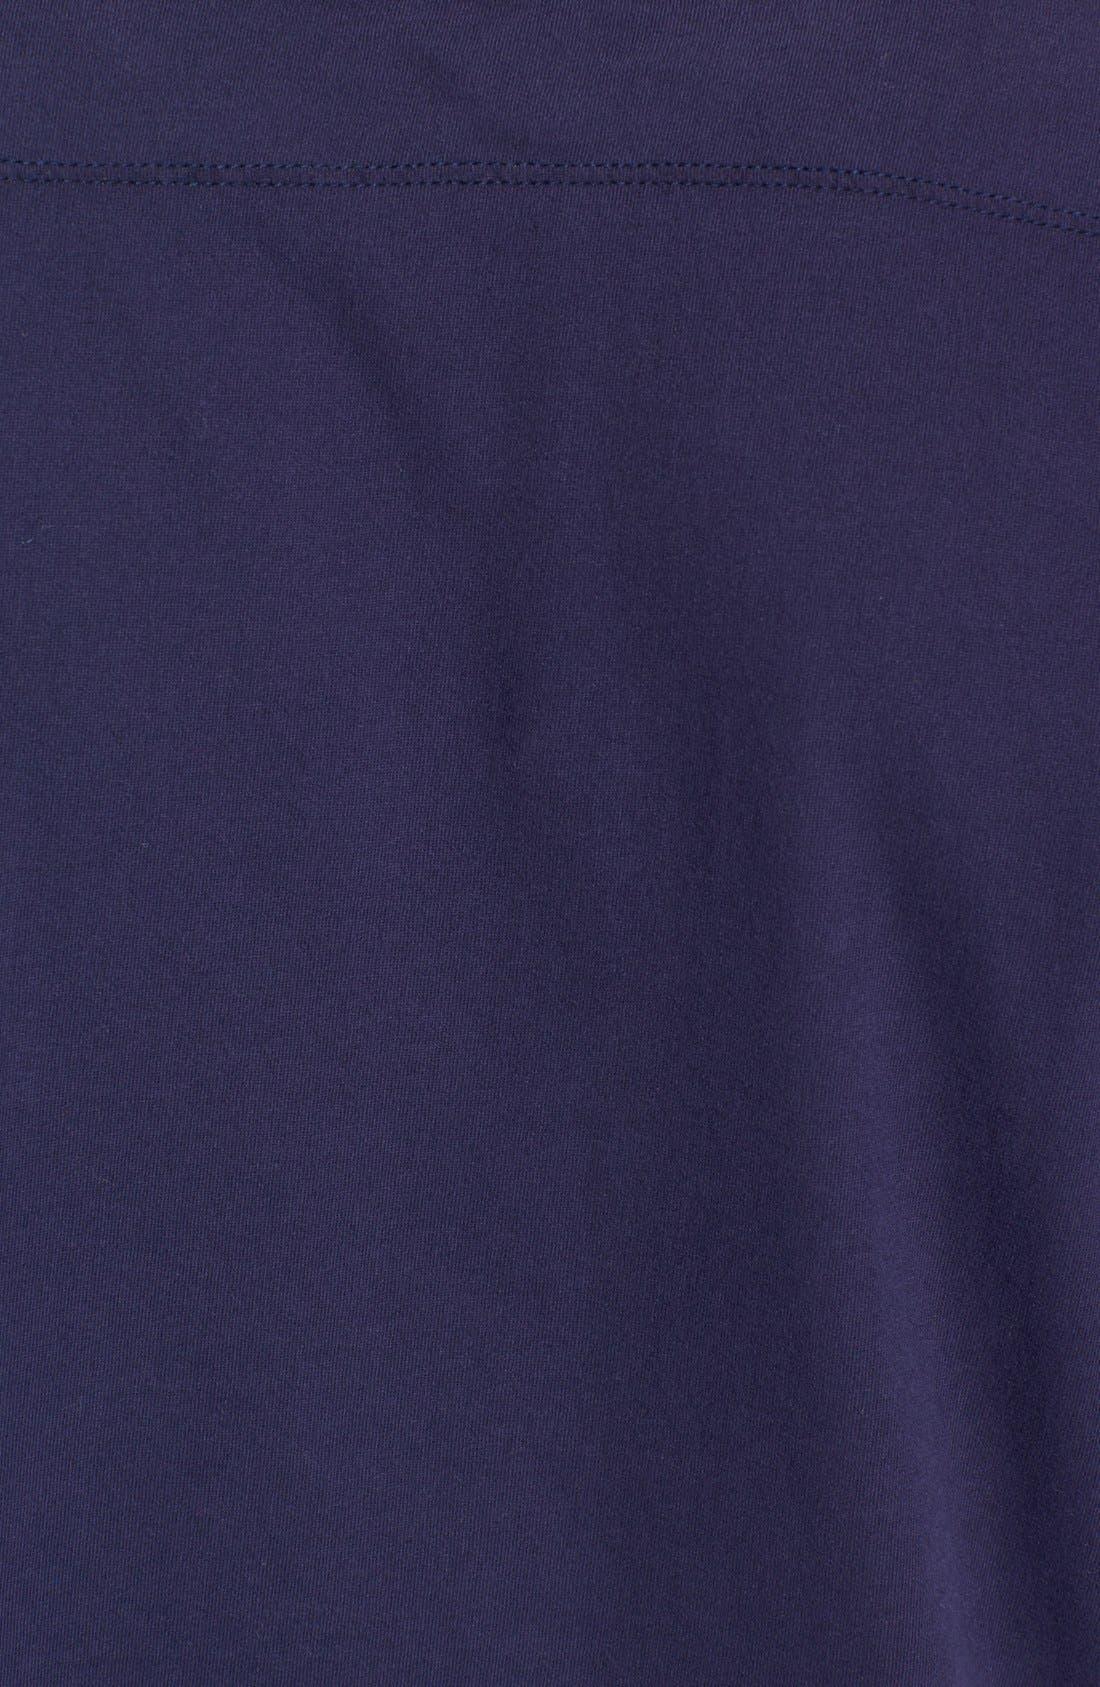 Alternate Image 3  - French Connection 'Flying Skull' T-Shirt